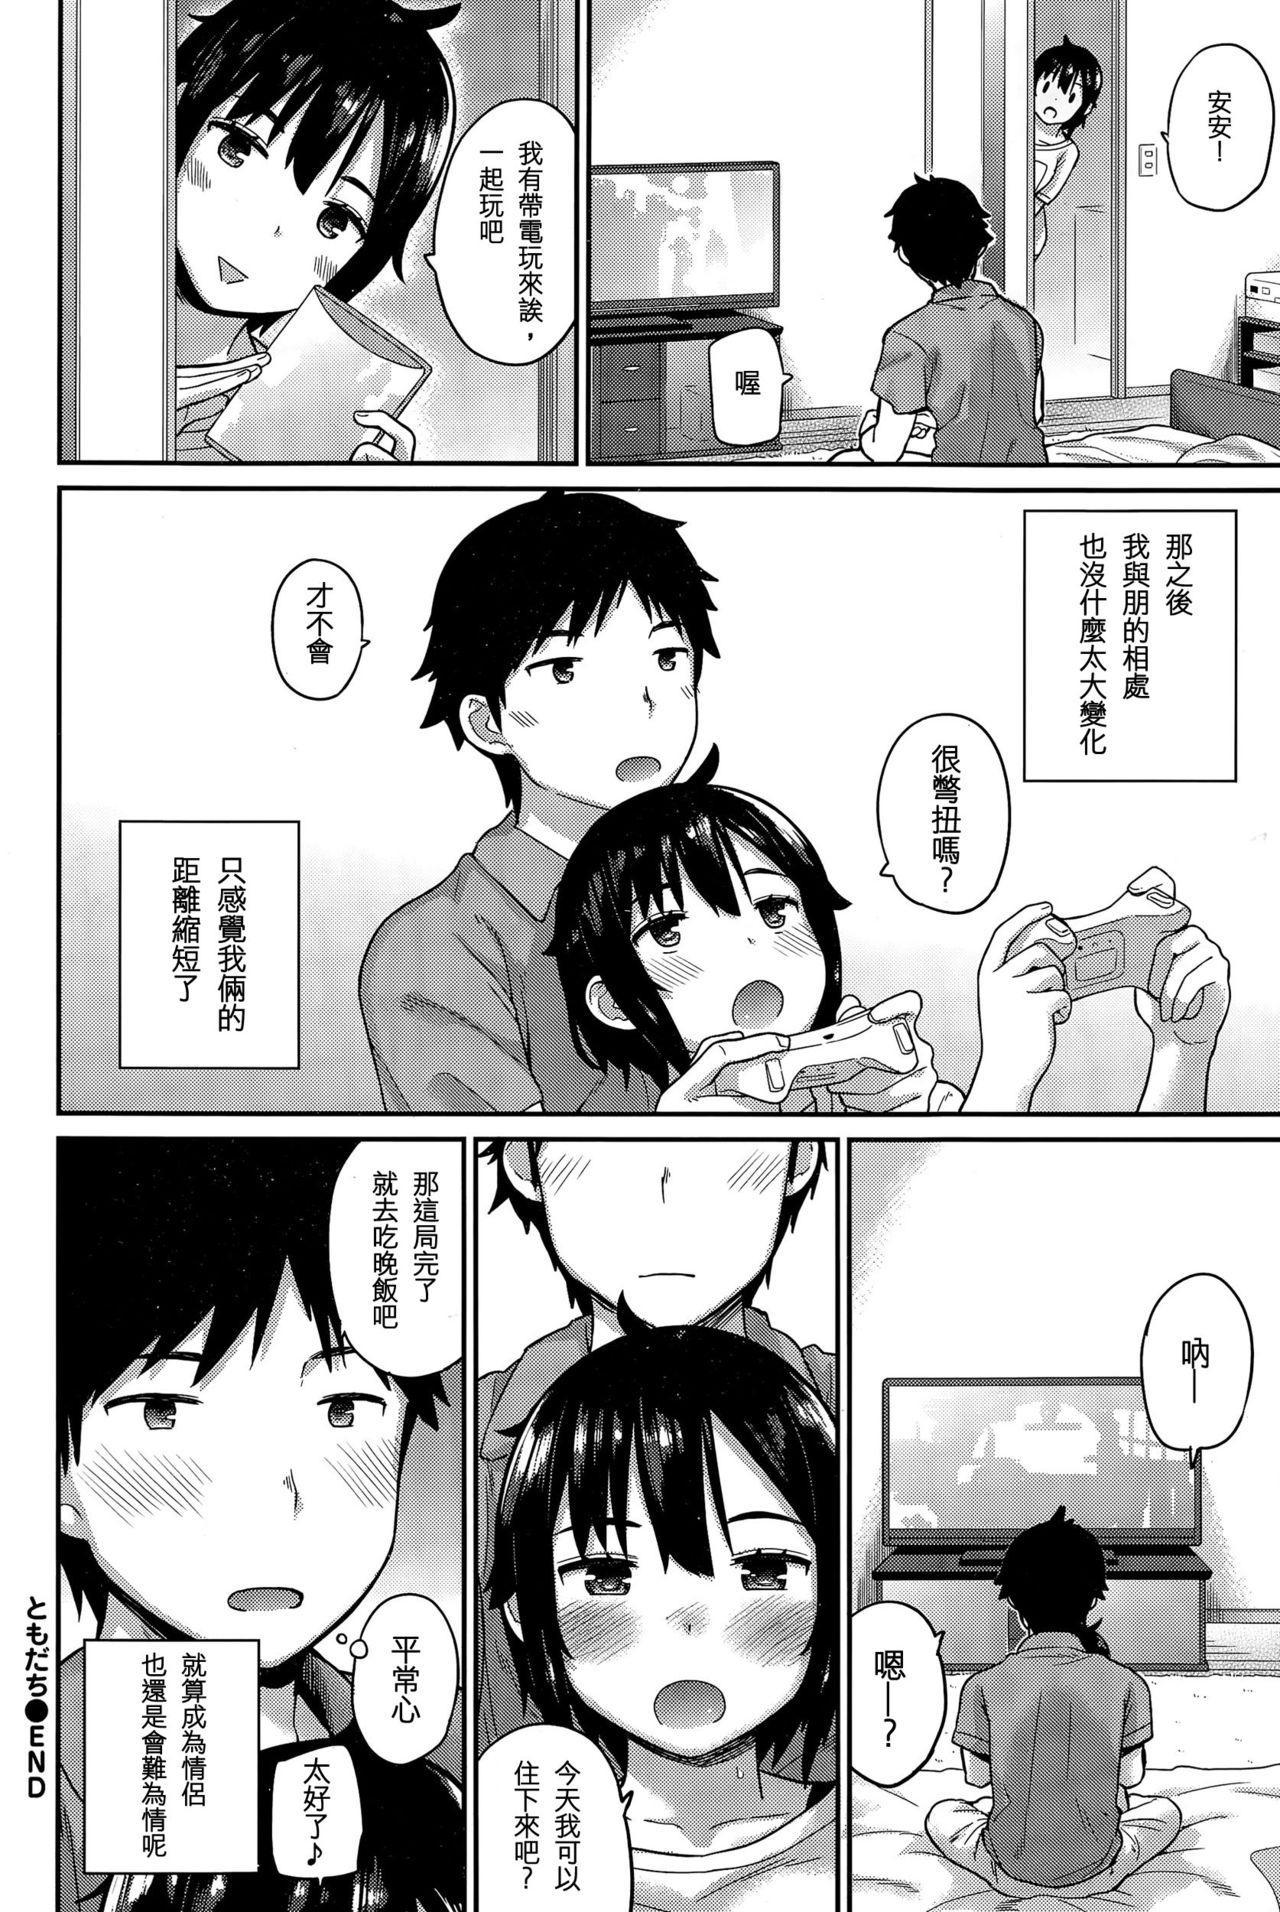 Tomodachi - Friend 24